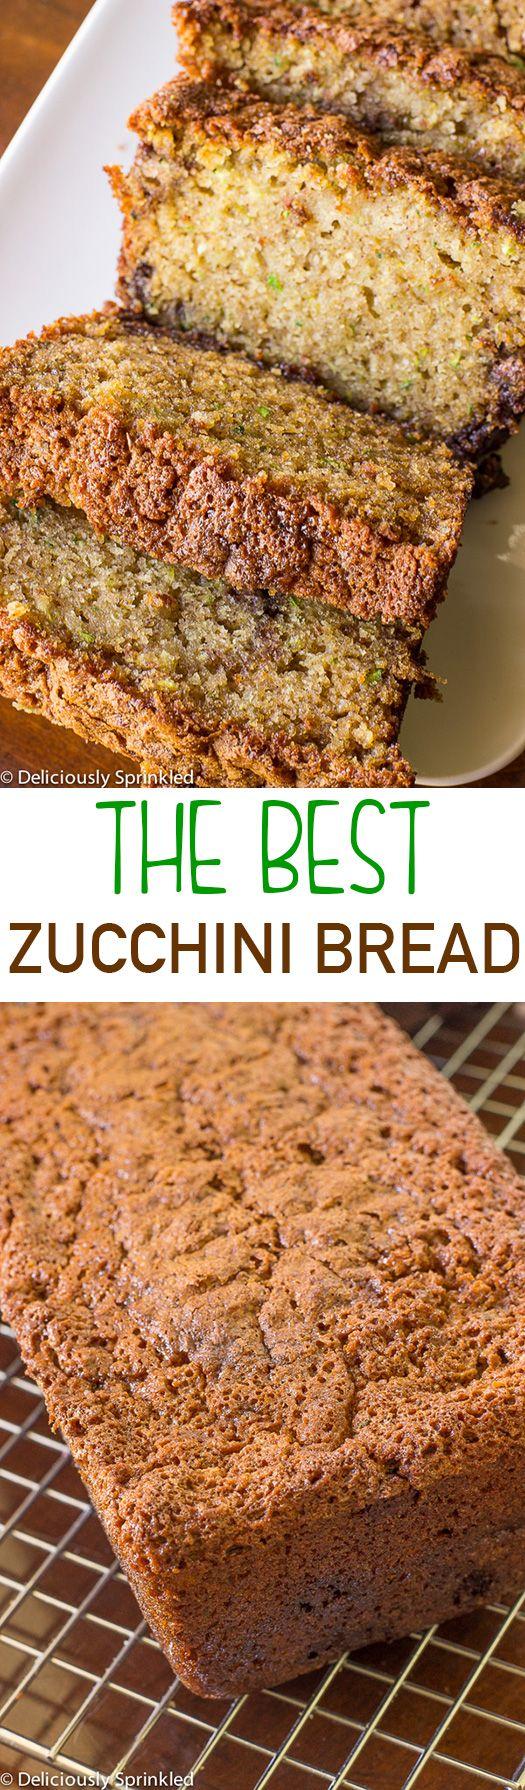 The BEST Zucchini Bread recipe EVER!